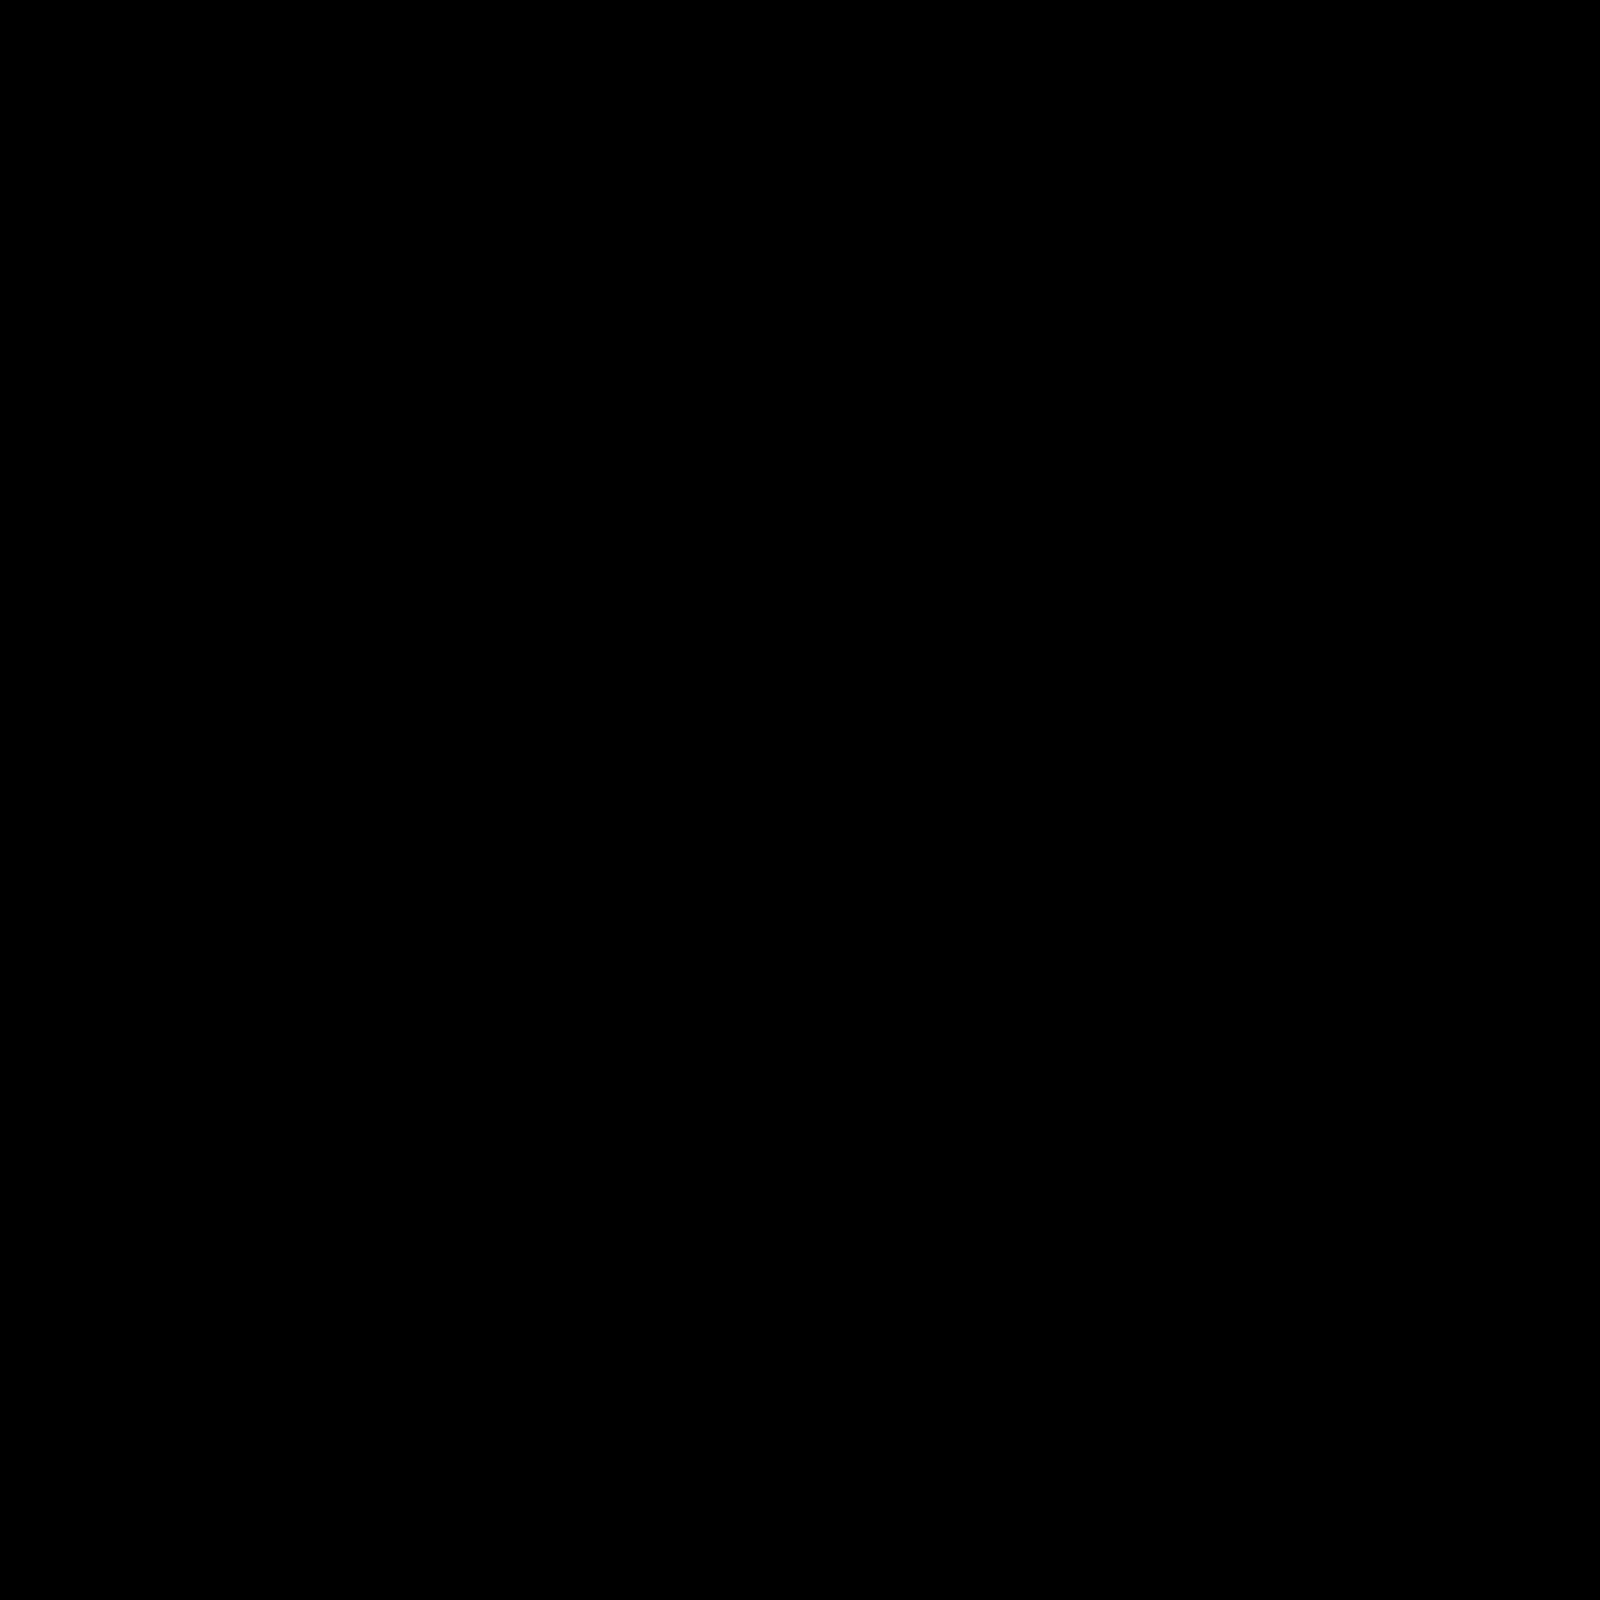 Headlight icon